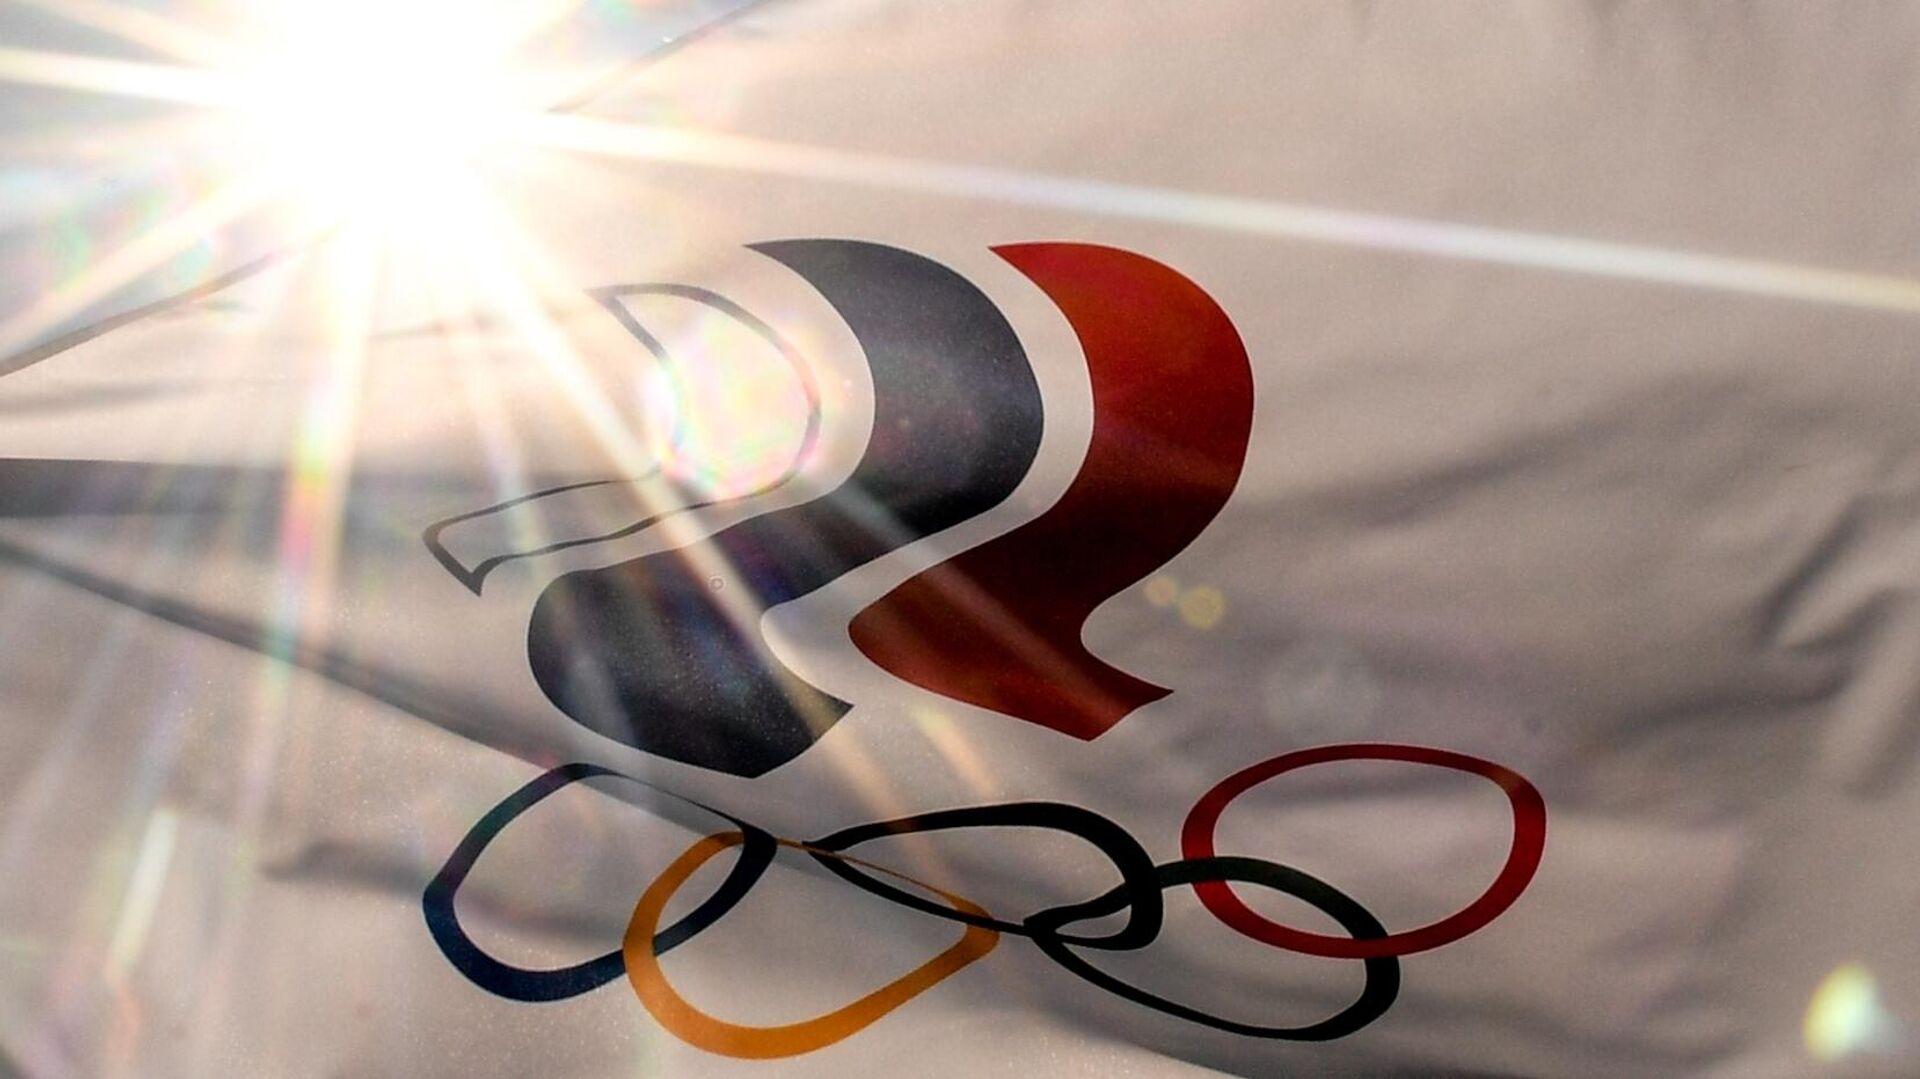 Флаг с символикой Олимпийских игр в Токио - РИА Новости, 1920, 24.07.2021